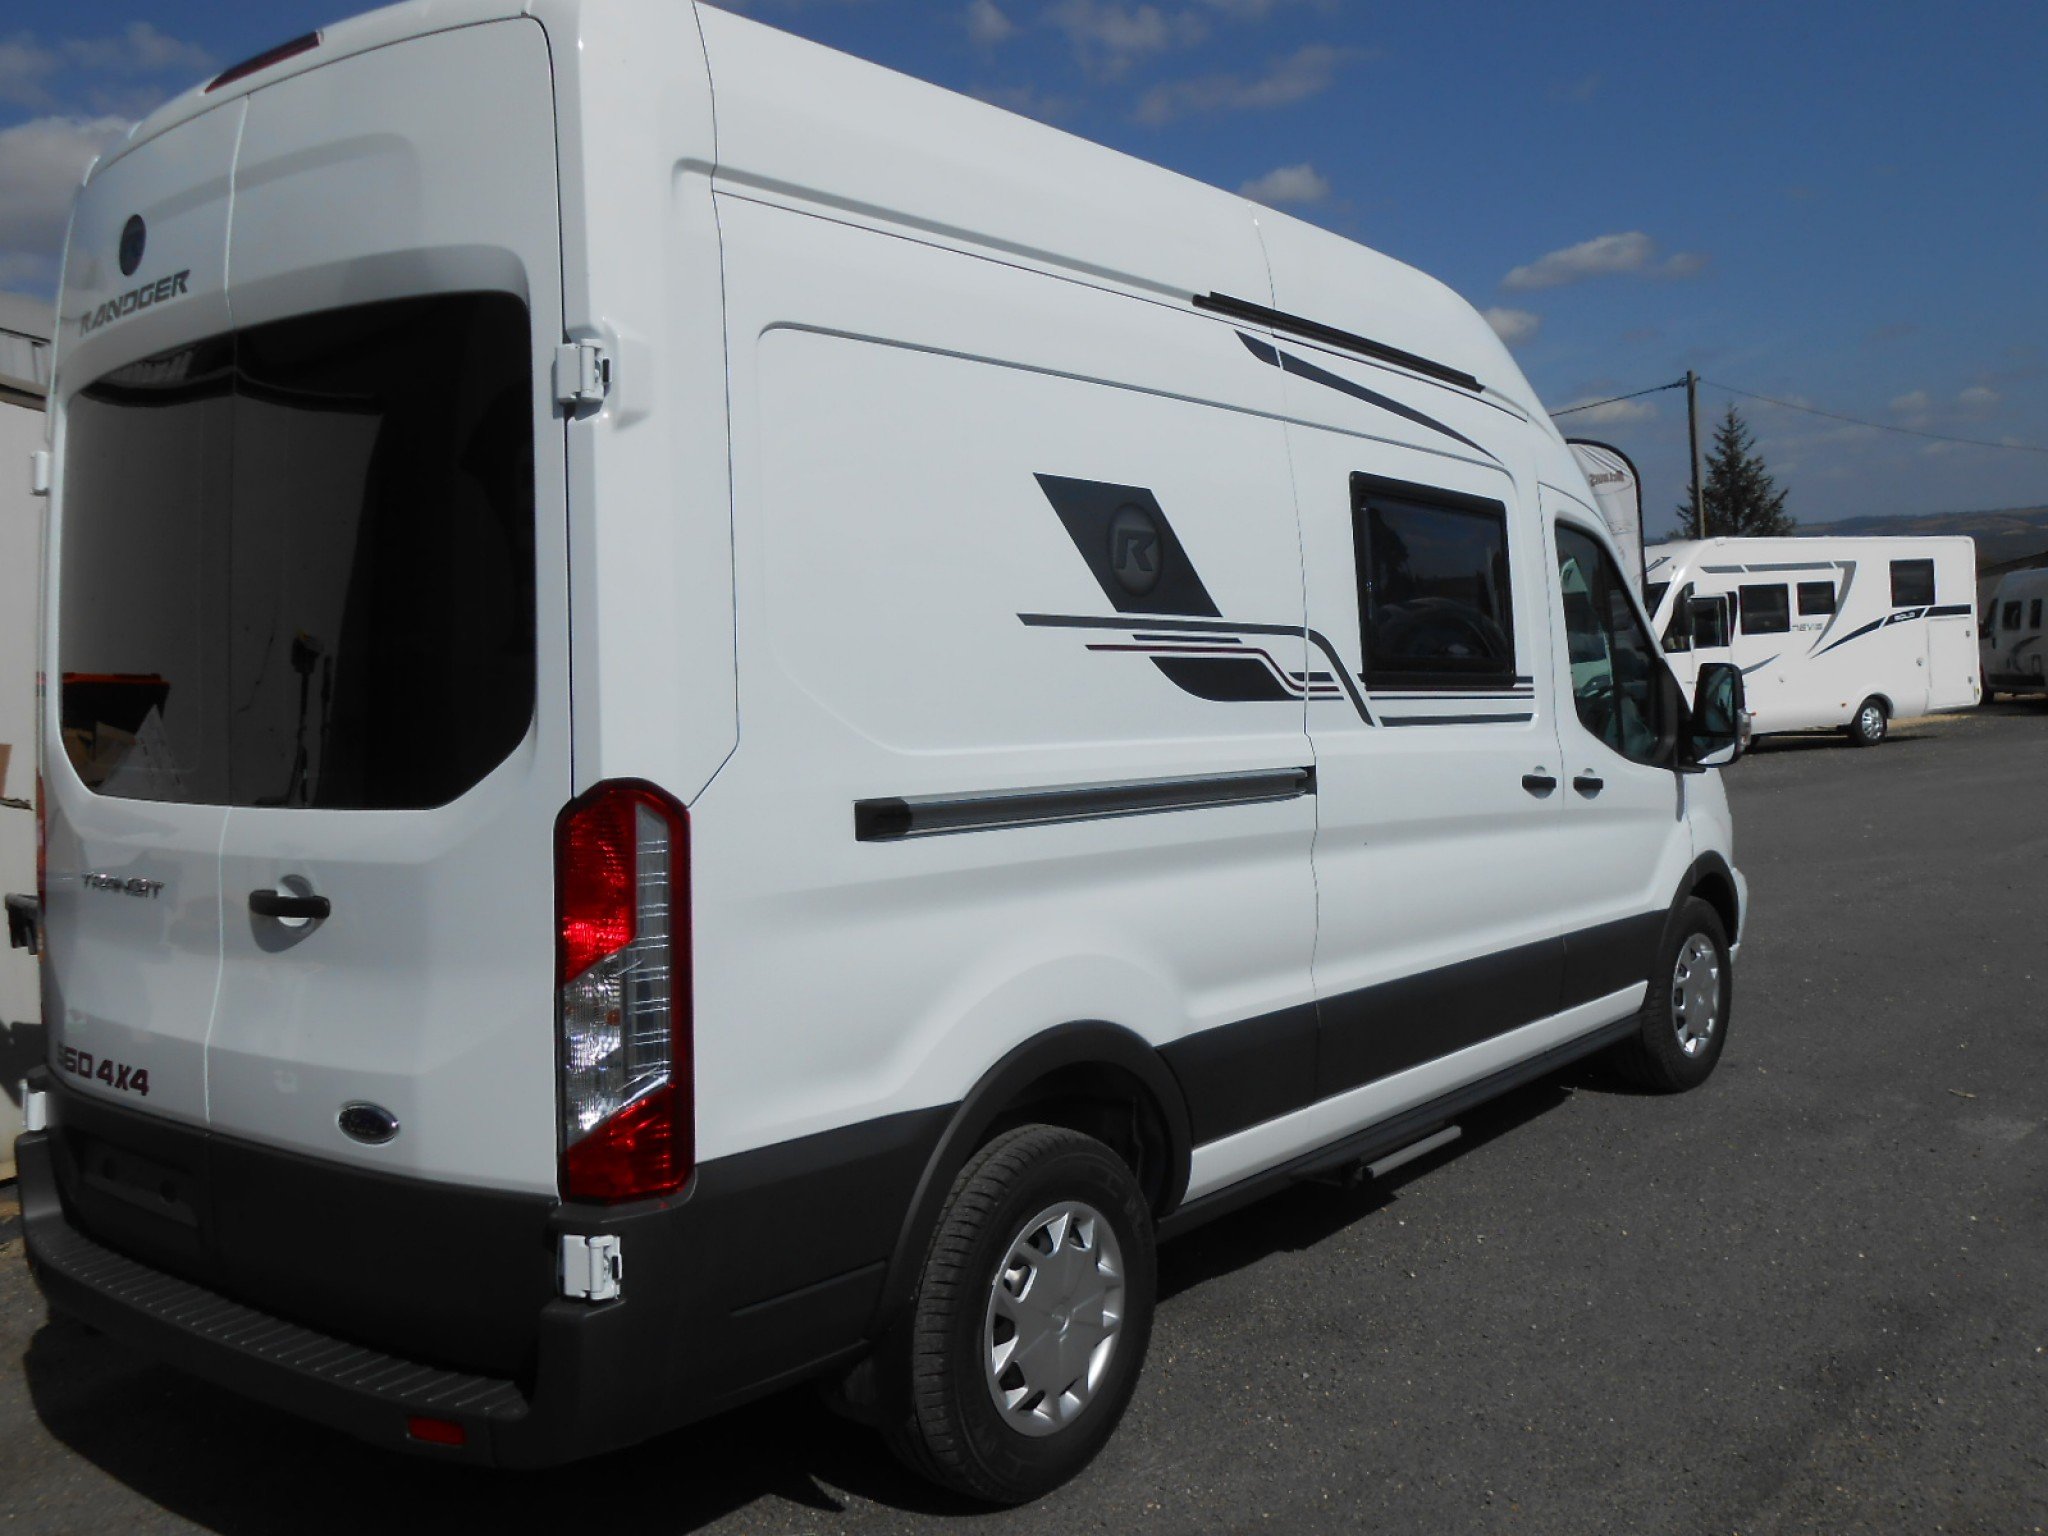 randger r560 4x4 neuf de 2019 ford camping car en vente la primaube aveyron 12. Black Bedroom Furniture Sets. Home Design Ideas